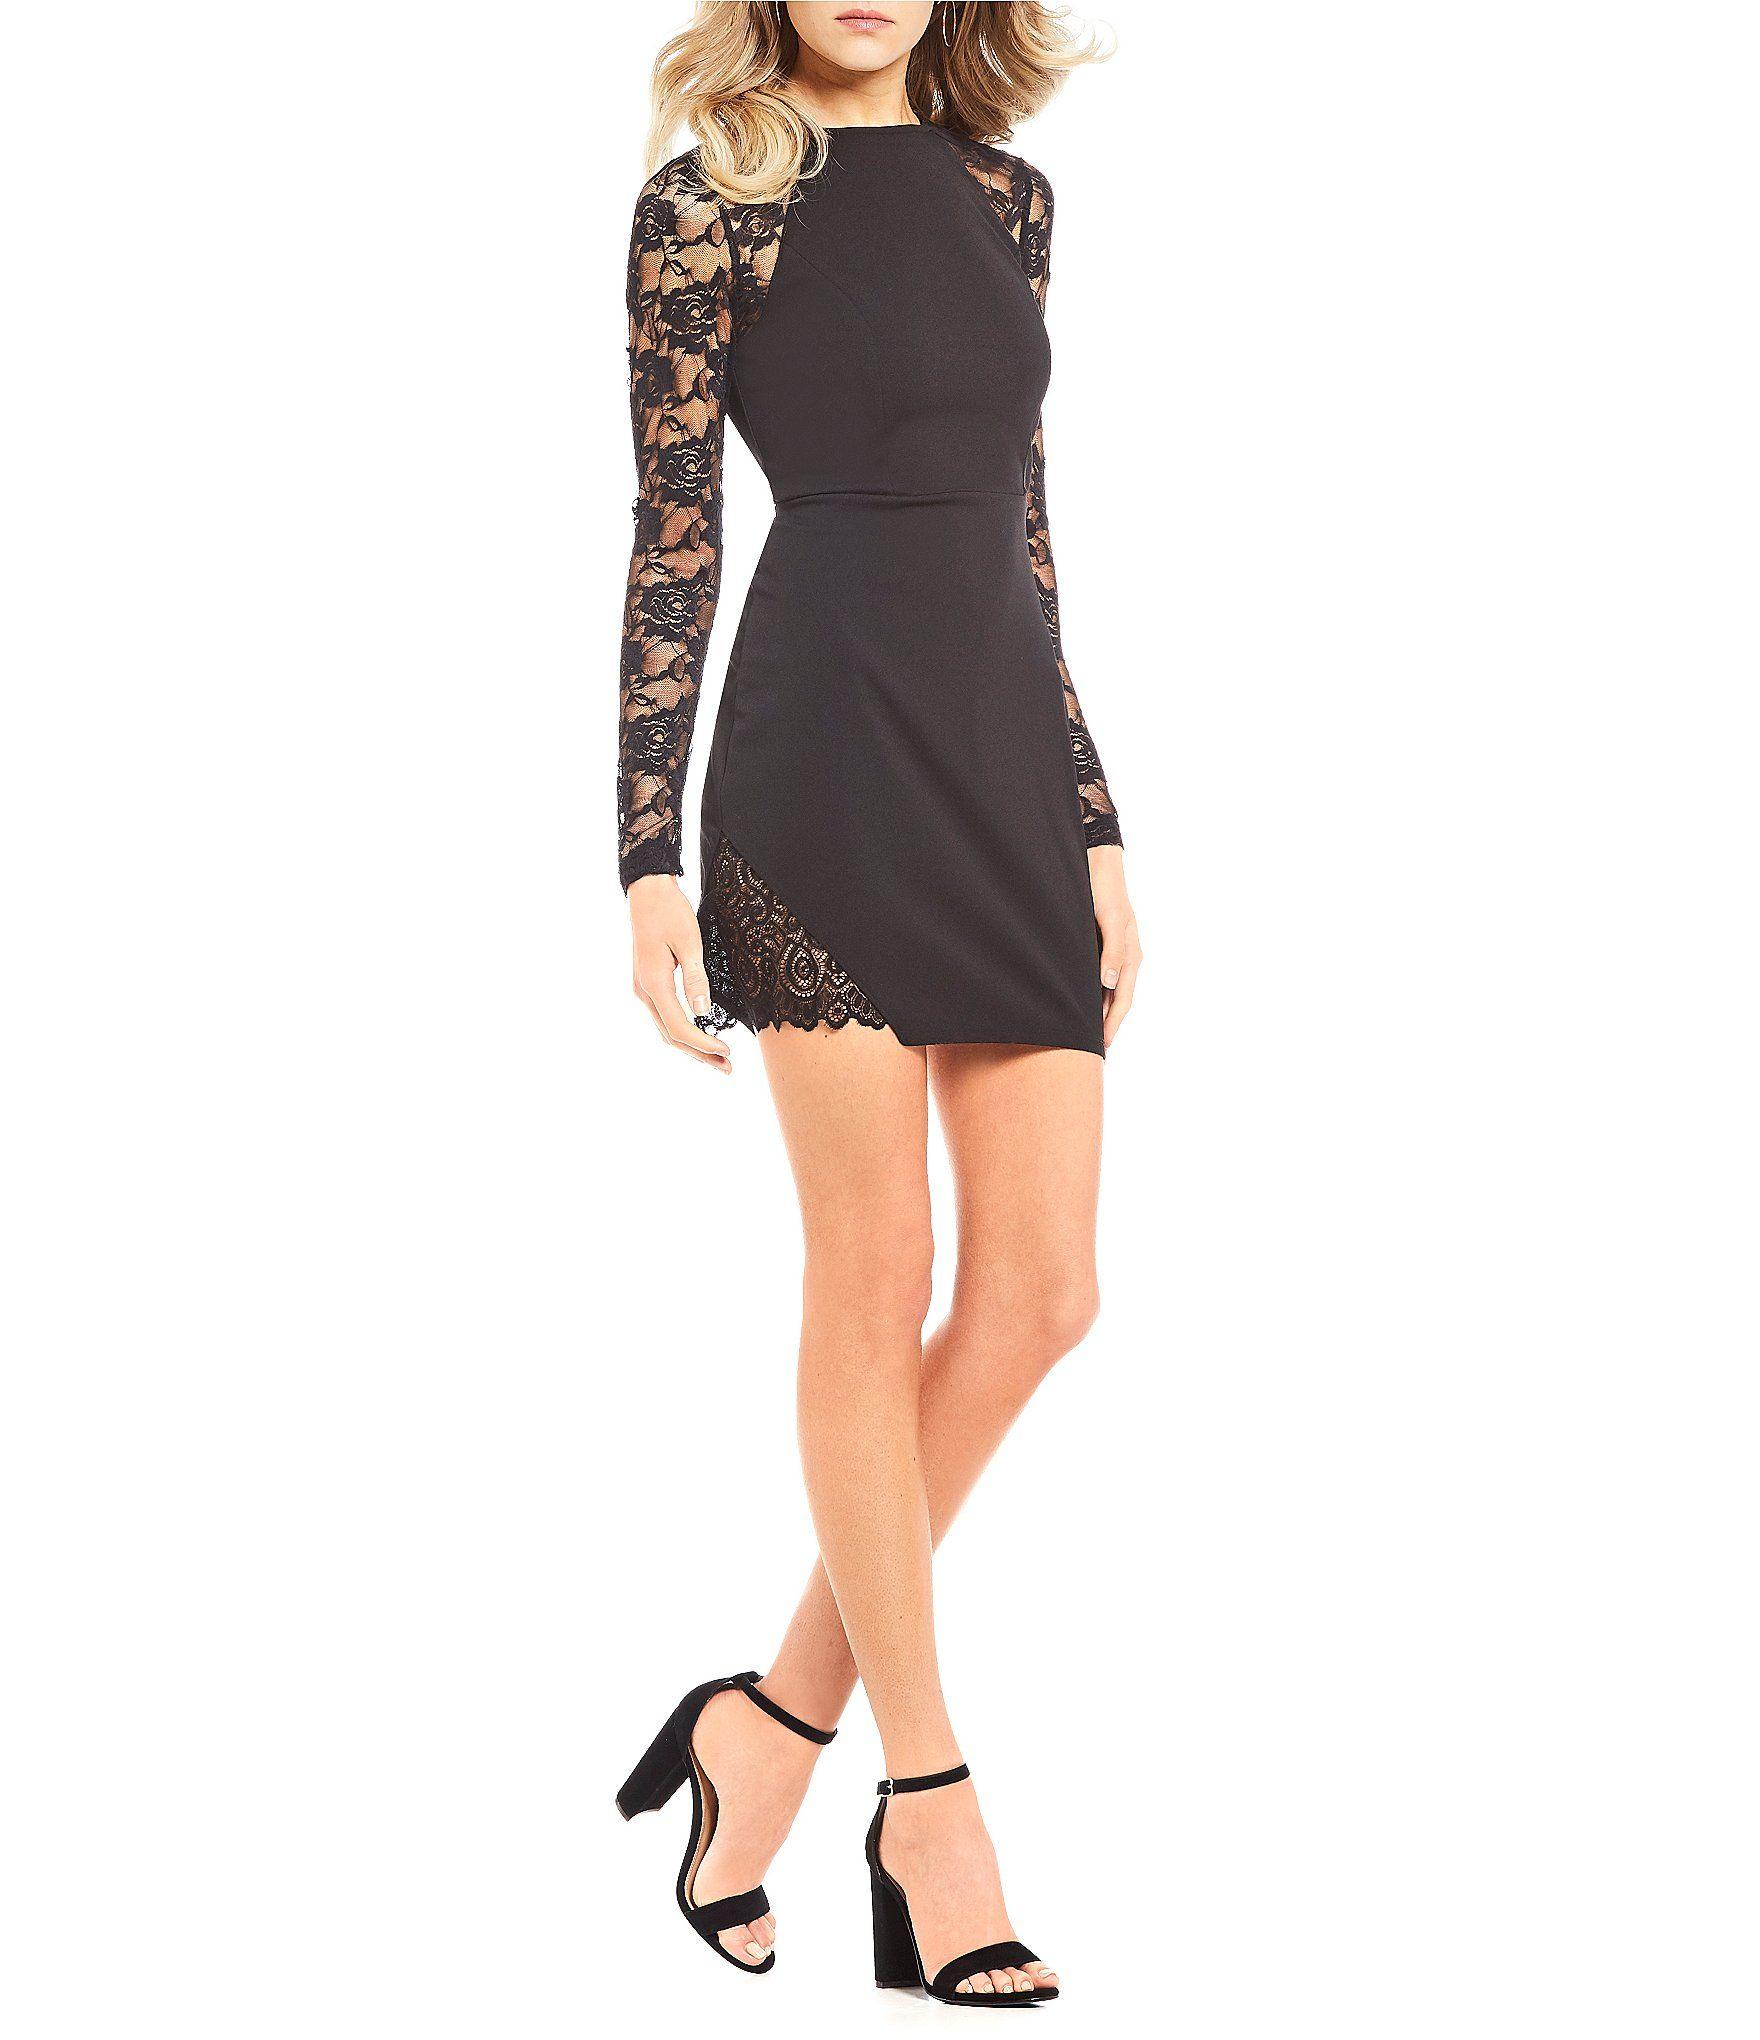 Honey and rosie lace long sleeve sheath dress dillards prom